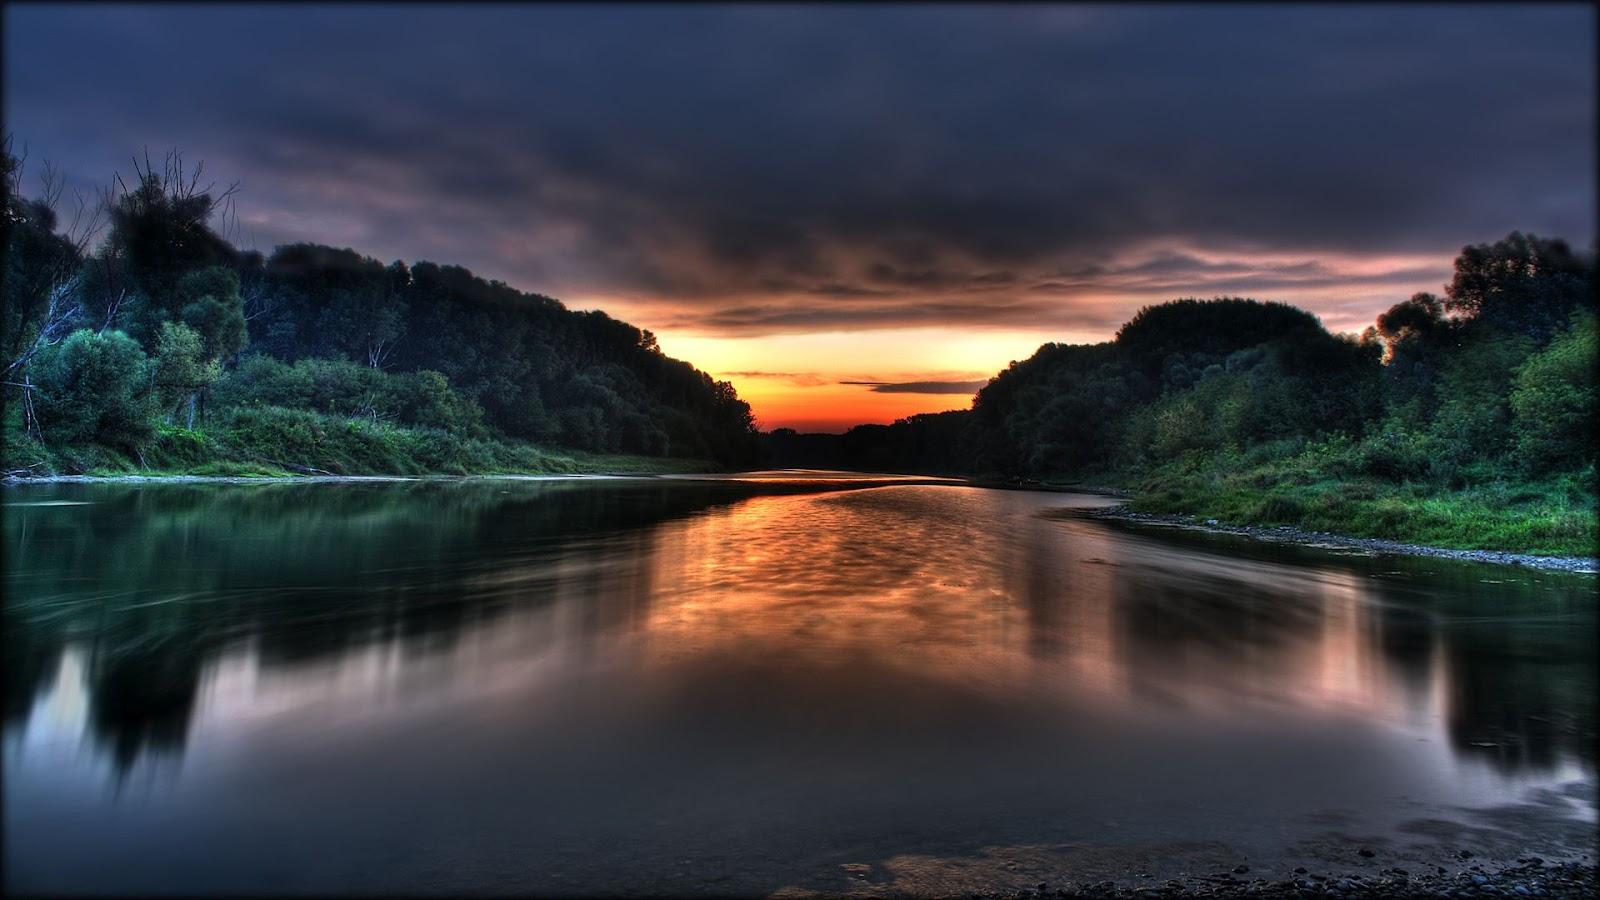 Widescreen Full Hd Size Nature Lake Water Mountains - Sunrise Hd Wallpaper 1080p - HD Wallpaper